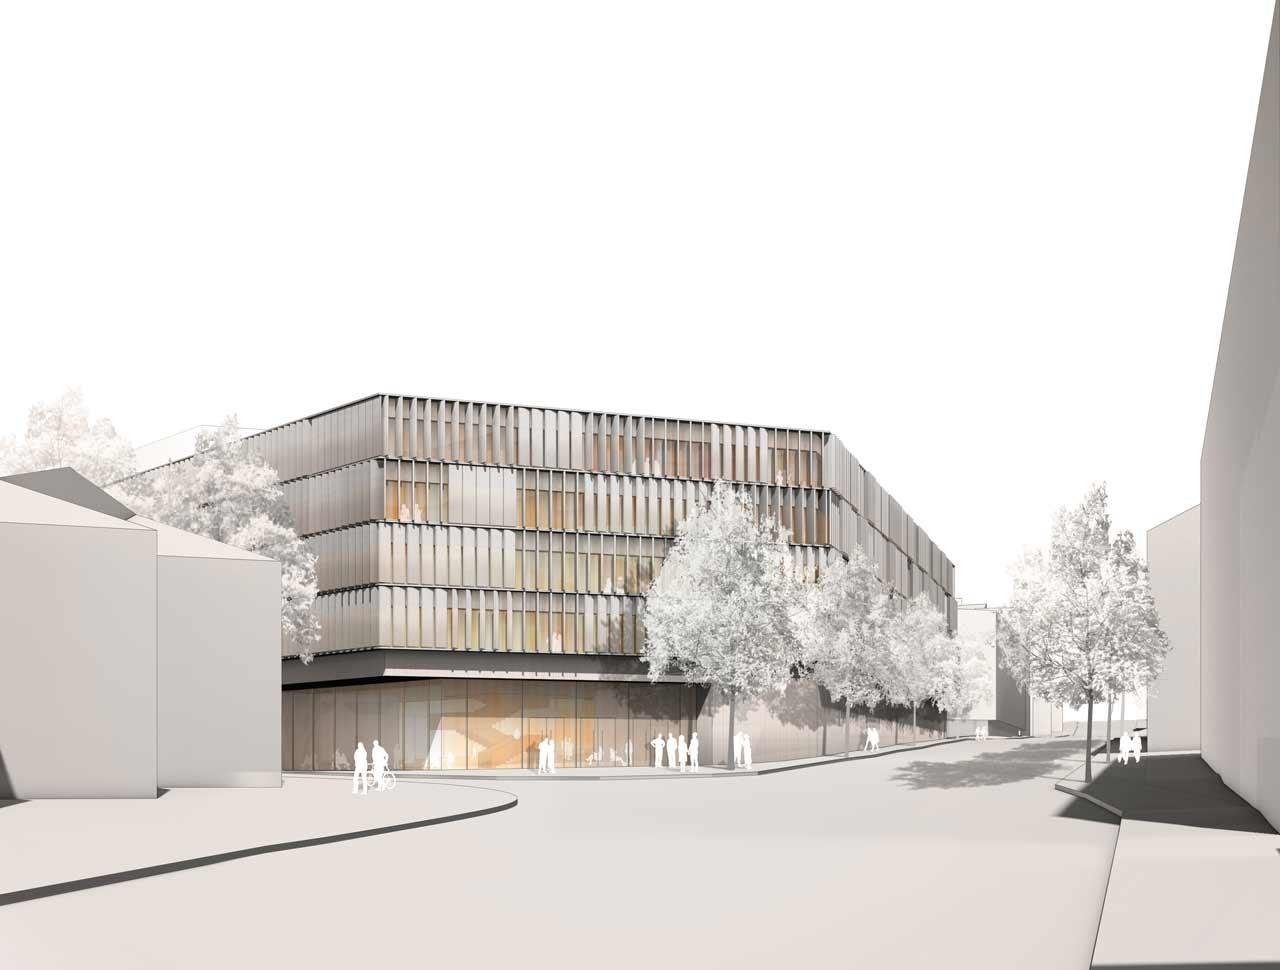 Stuttgart, Duale Hochschule